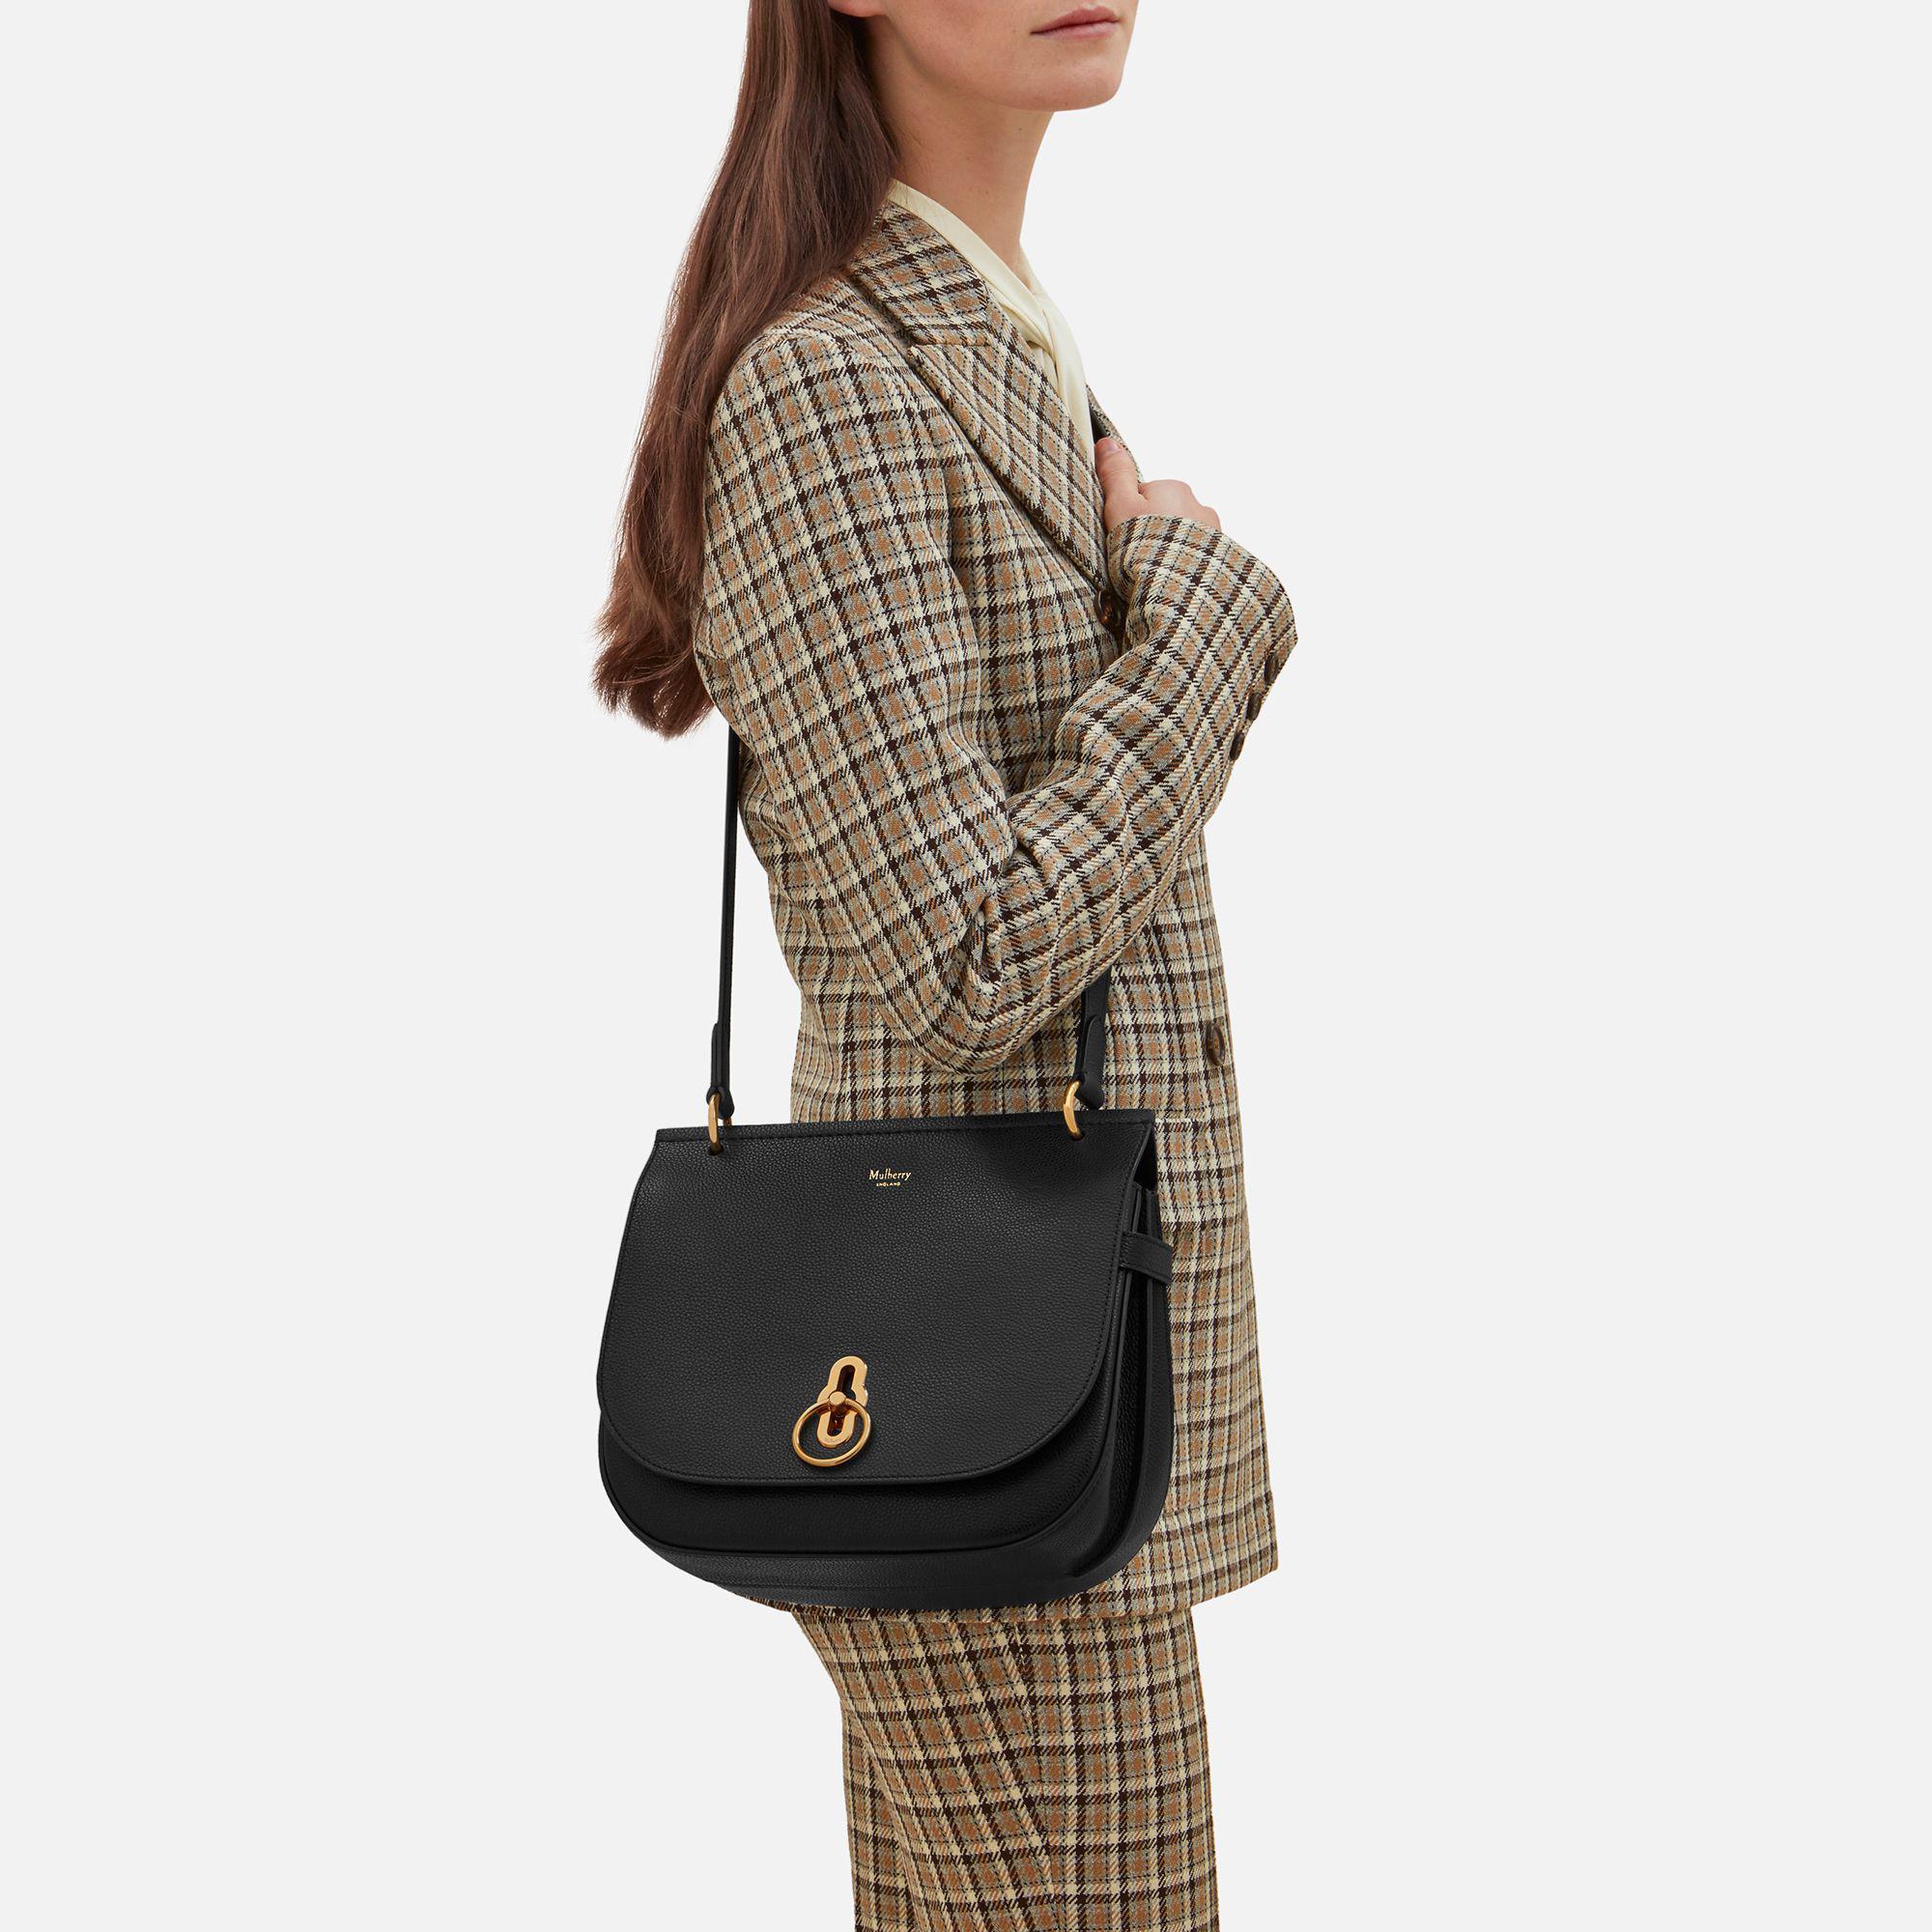 45d1f415c0b1 ... official store mulberry black amberley satchel lyst. view fullscreen  728a5 ca33e